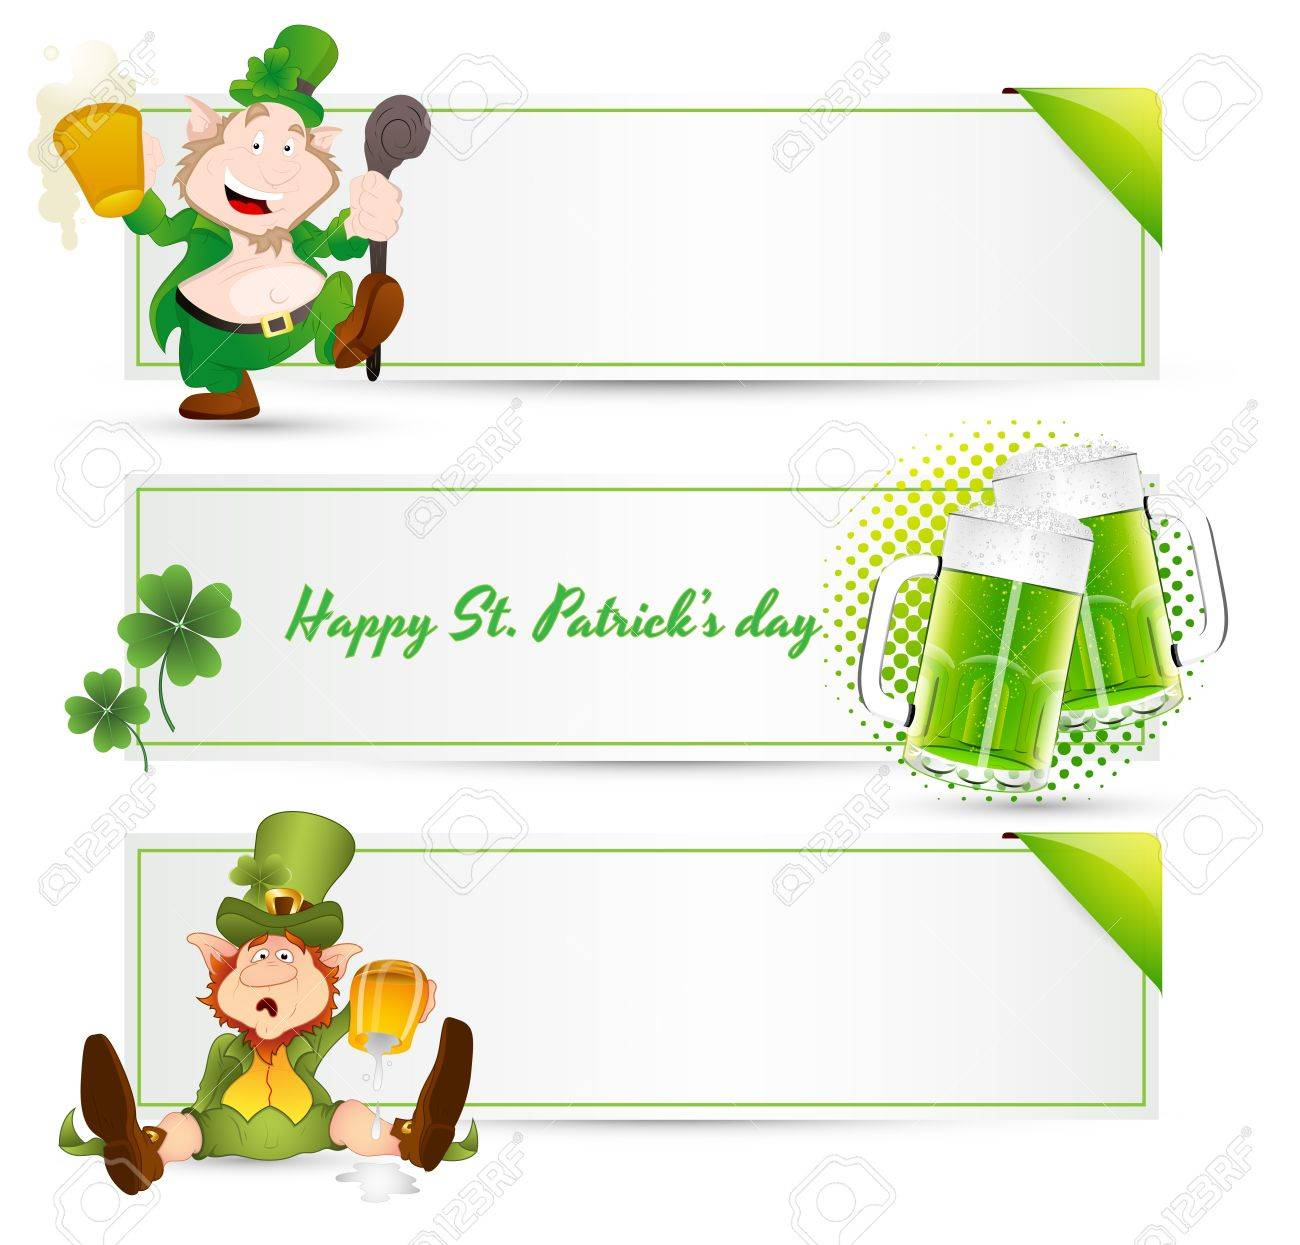 St  Patrick's Day Leprechaun Banners Stock Vector - 12655121